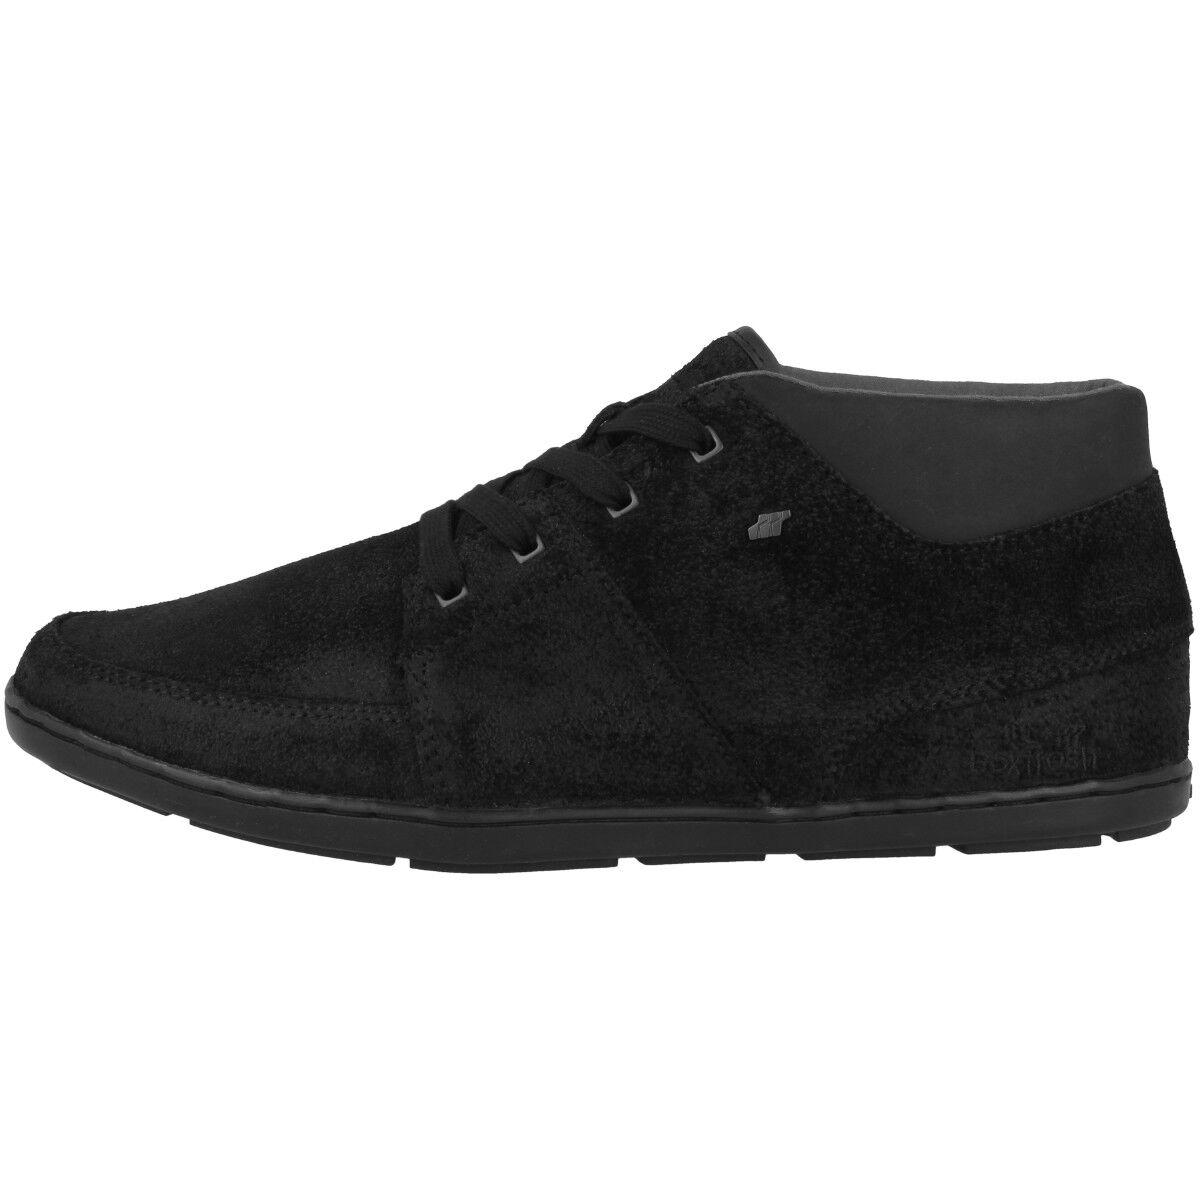 Boxfresh Cluff CH Waxed Suede Schuhe High Top Sneaker Mid Cut Sneakers E15425